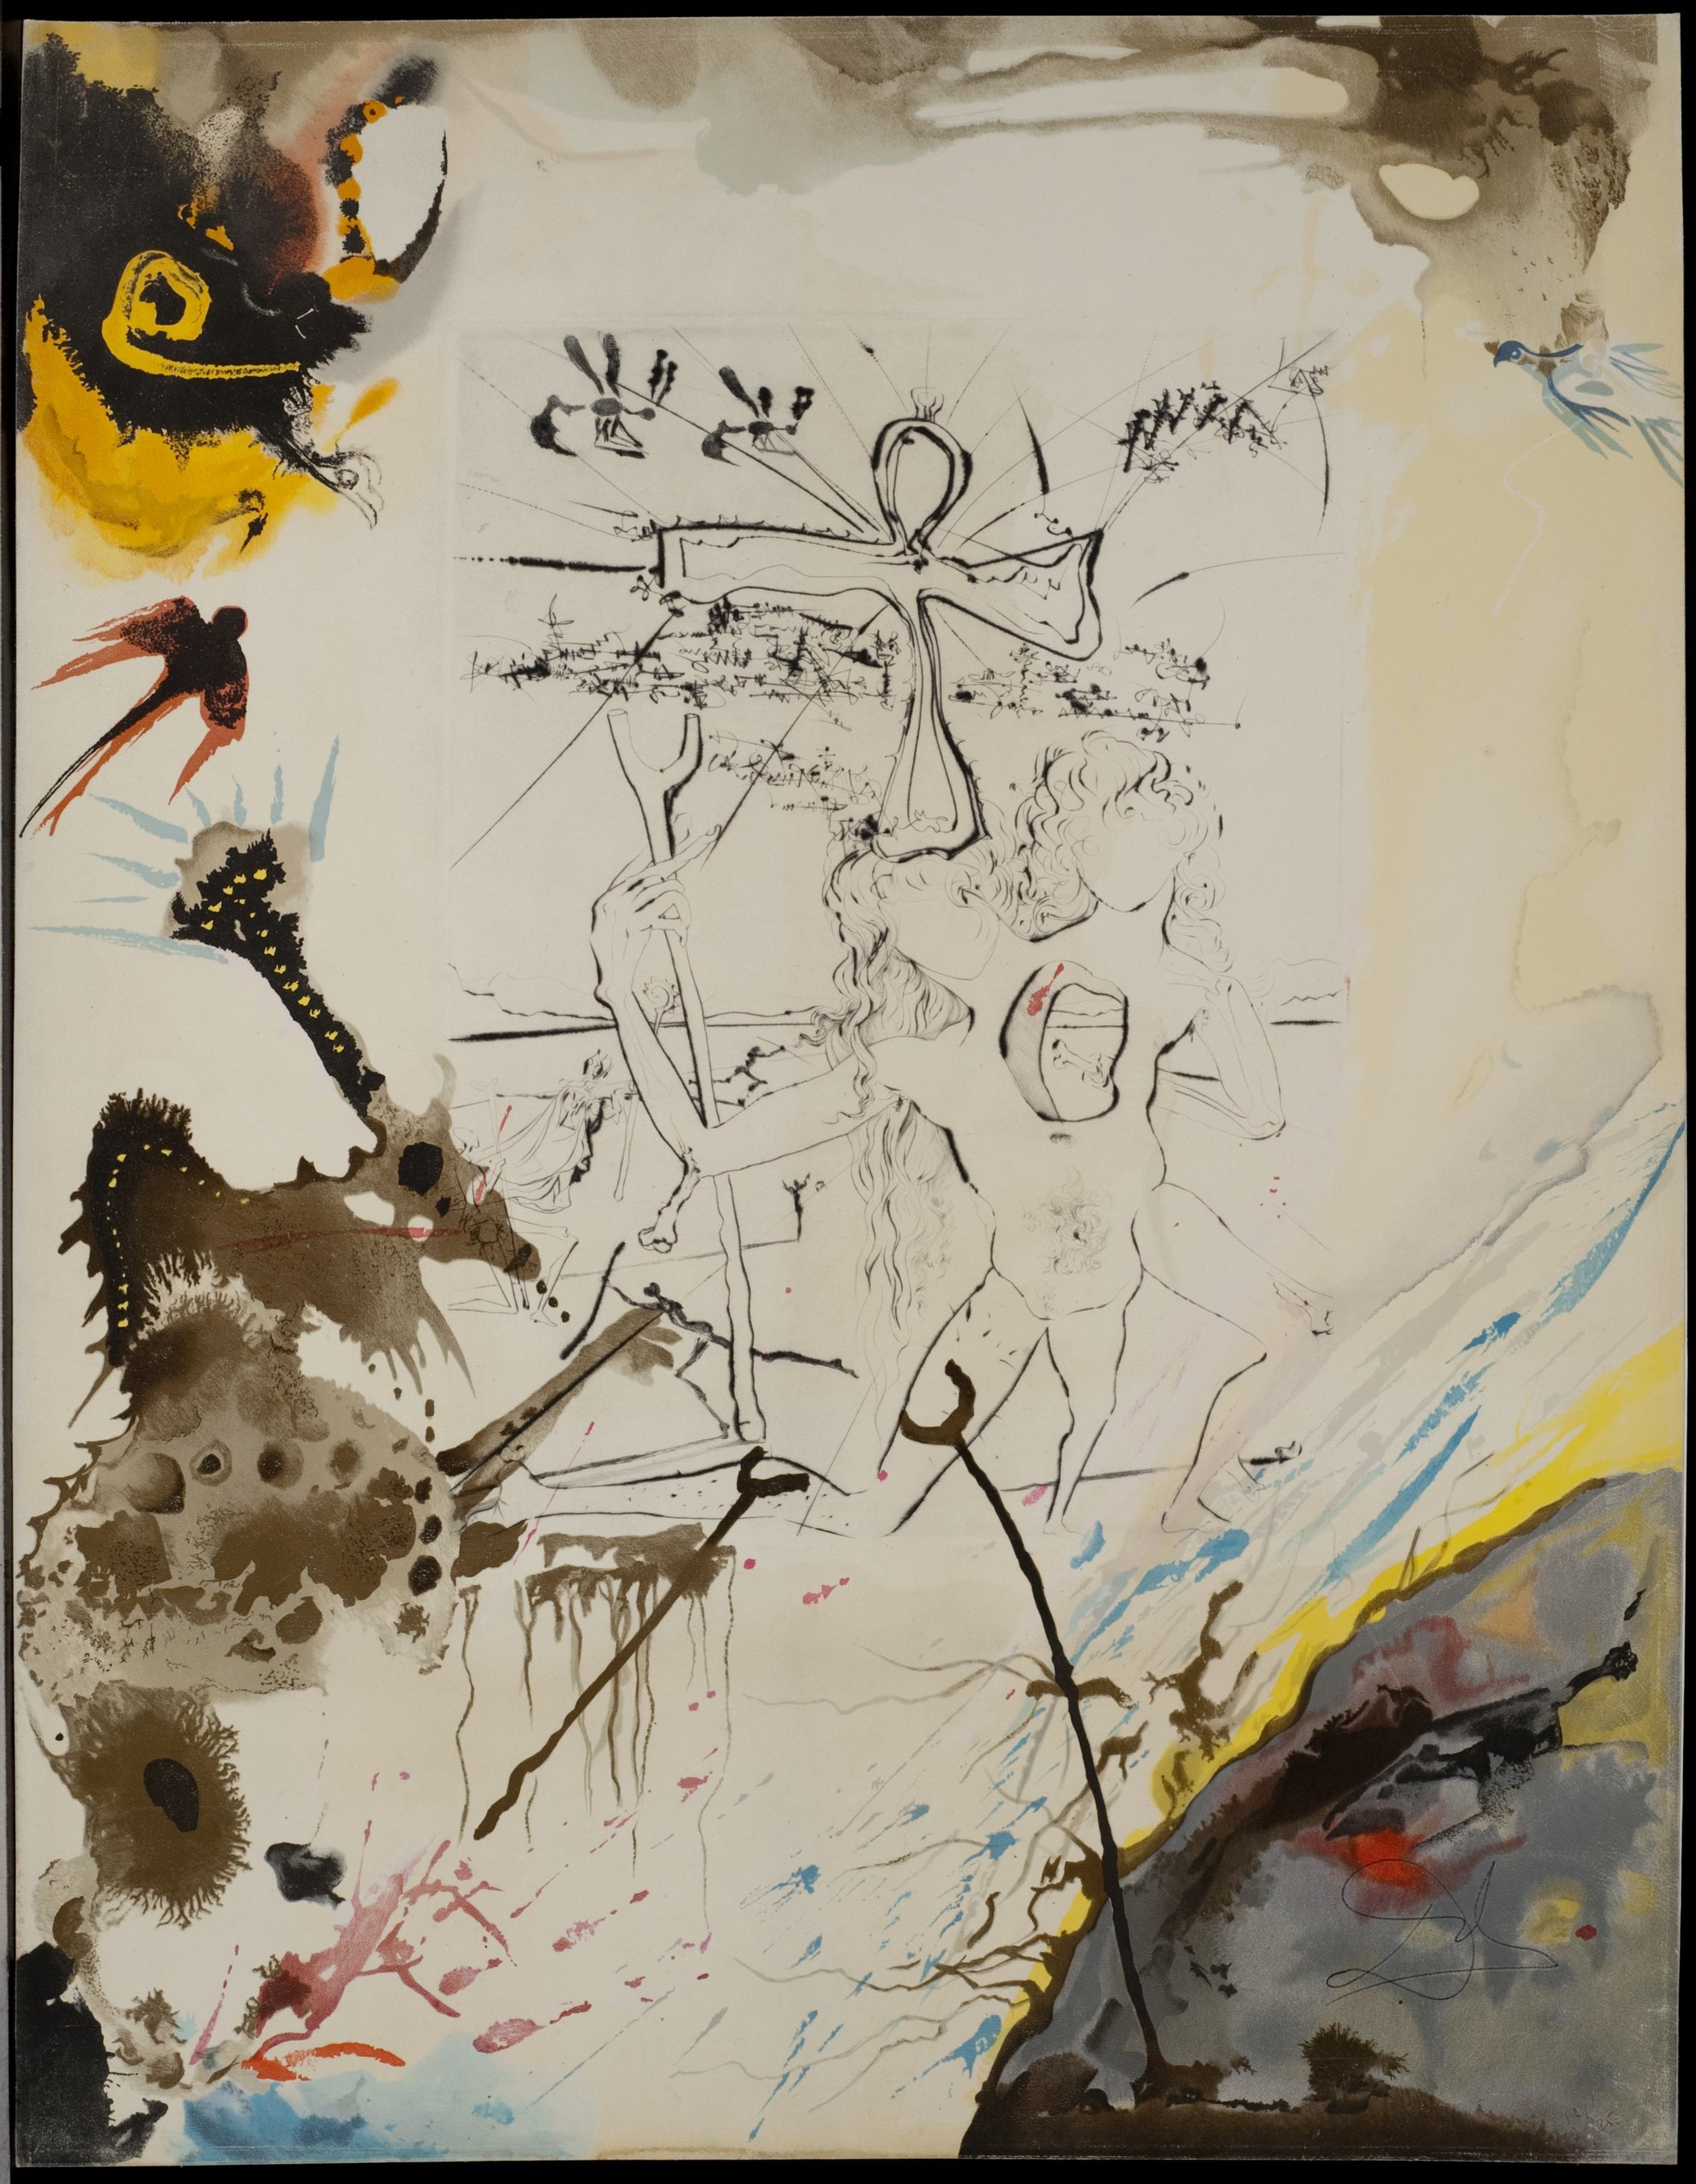 Moise et Akehenaton , 1975 Lithograph on soft glove sheepskin 25 50/127h x 19 87/127w in